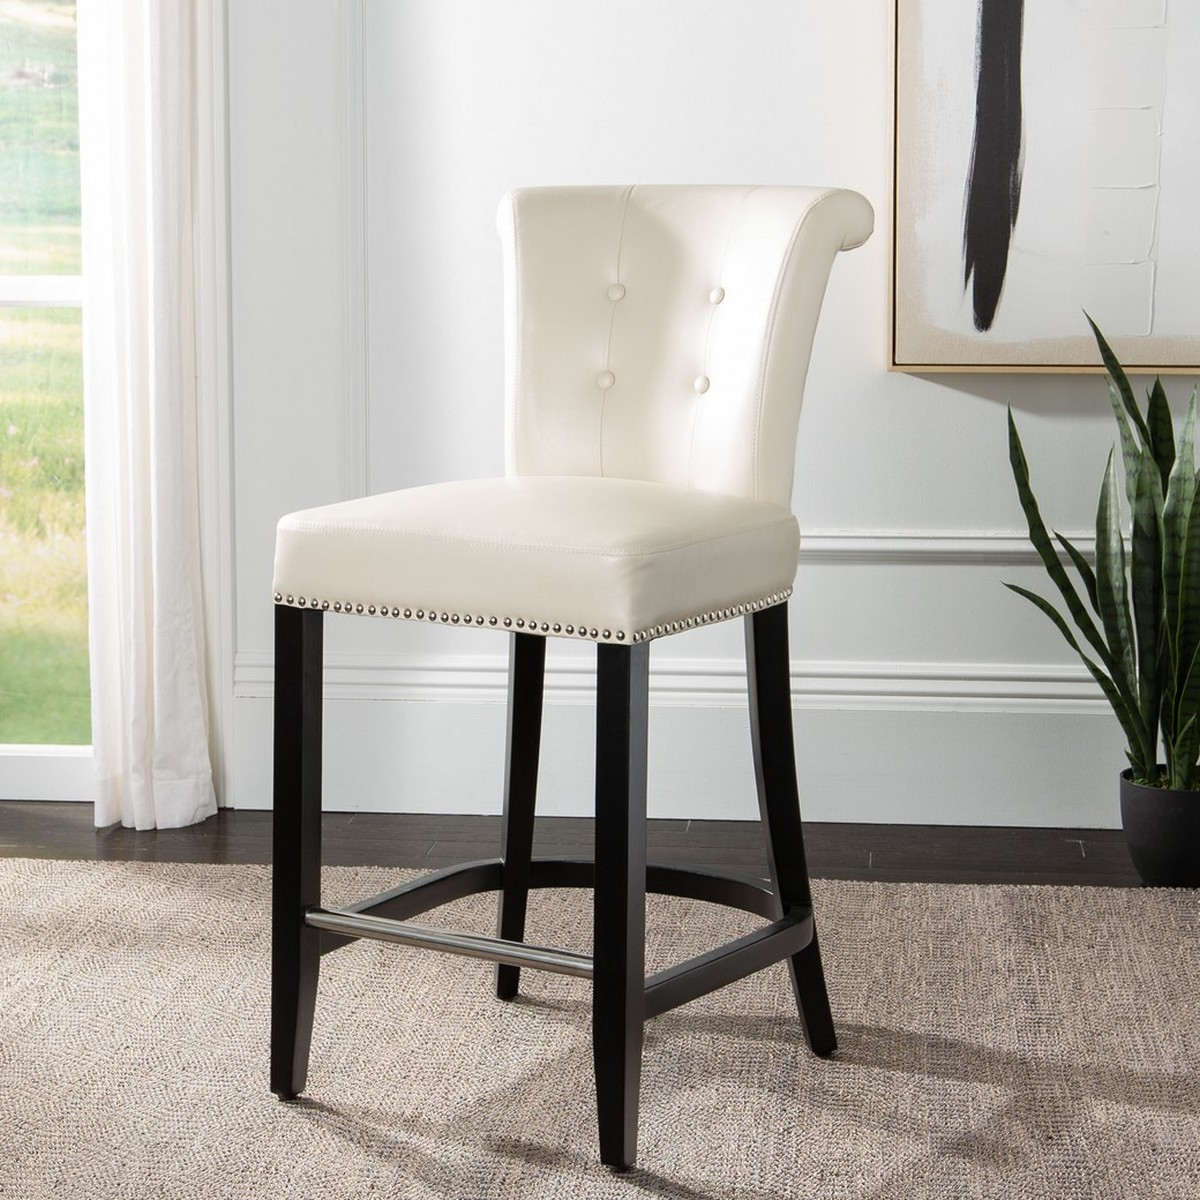 Peachy Hud8241D Counter Stools Furniture By Safavieh Creativecarmelina Interior Chair Design Creativecarmelinacom